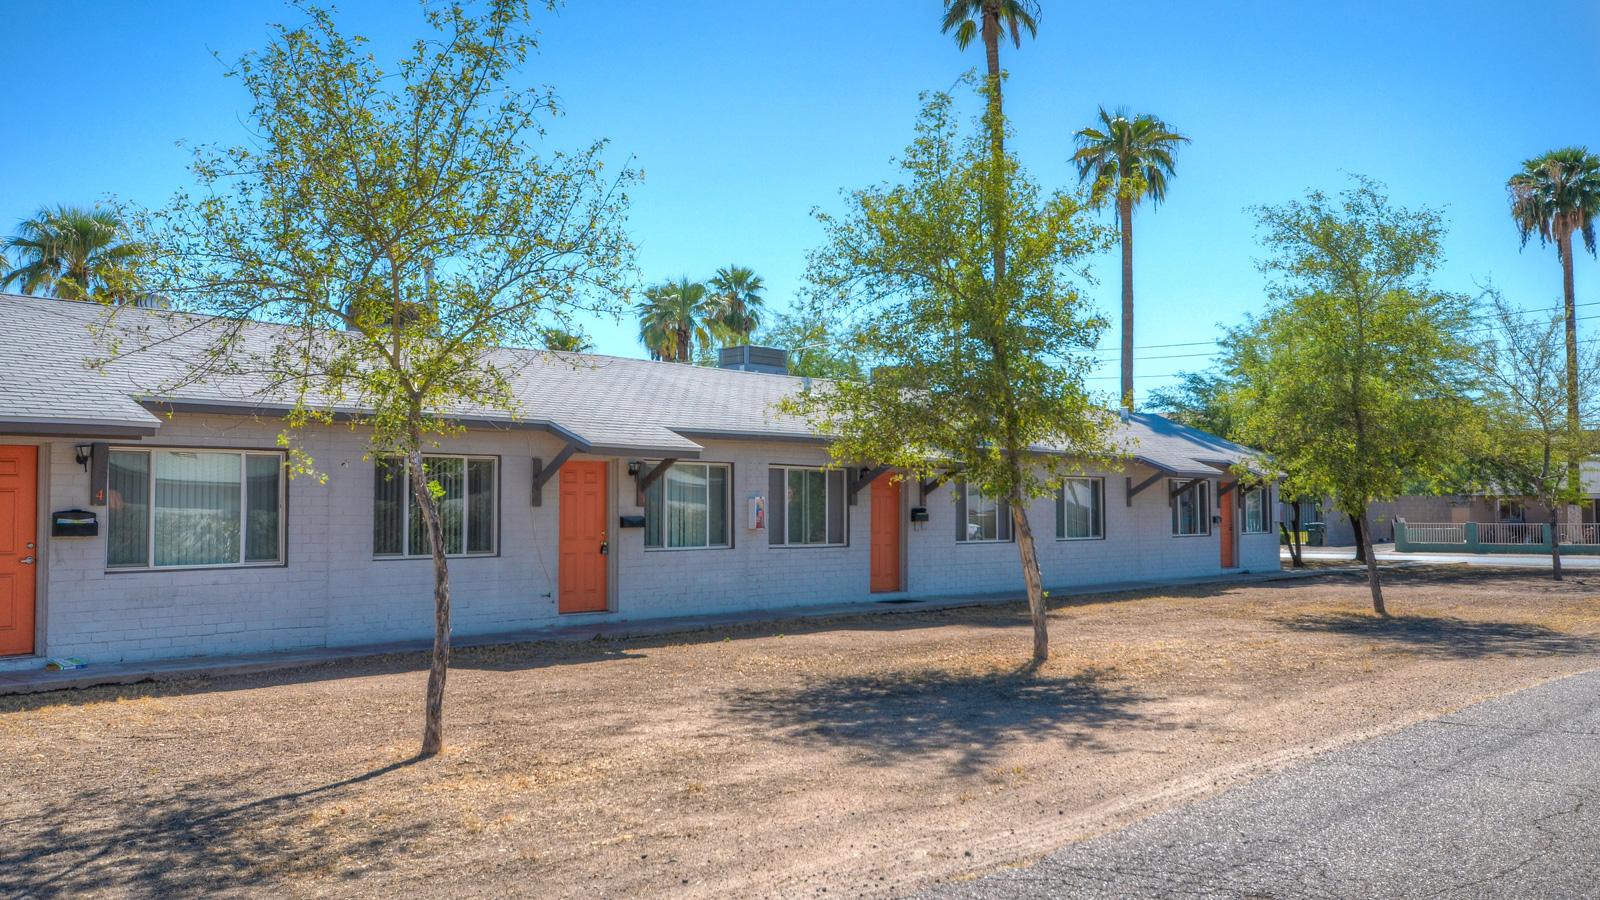 Encanto Park Apartments | 730-820 East Turney Avenue, Phoenix, AZ 85014 | 29 Units | Built in 1944 / 1946 / 1948 | $2,200,000 | $75,862 Per Unit | $121.59 Per SF